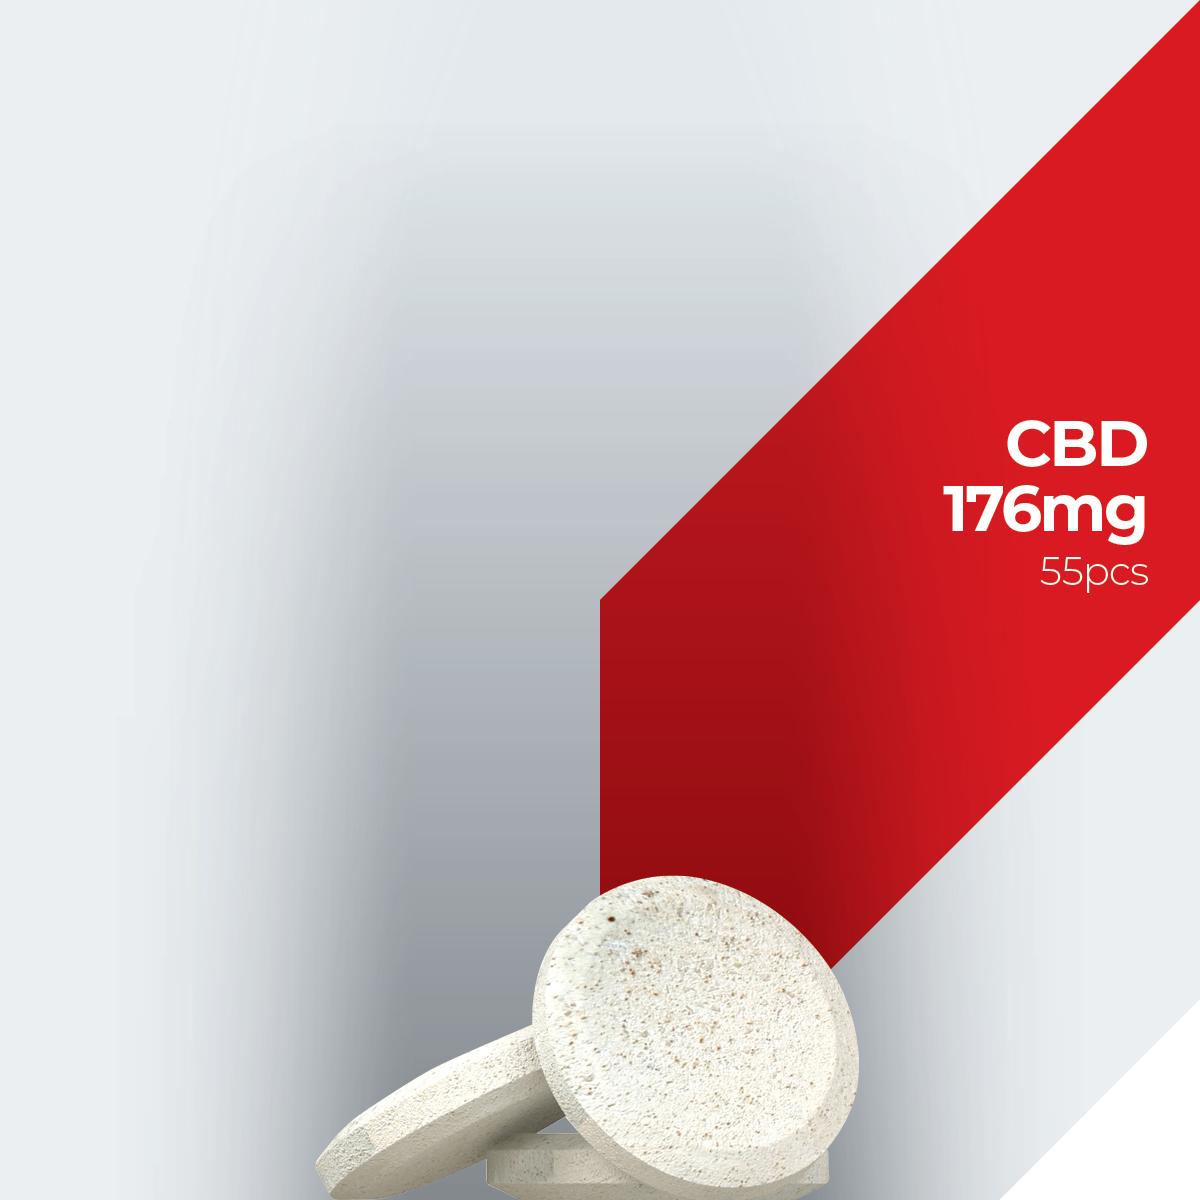 Labocan white label and private label cbd 176mg (55pcs) dog pastilles